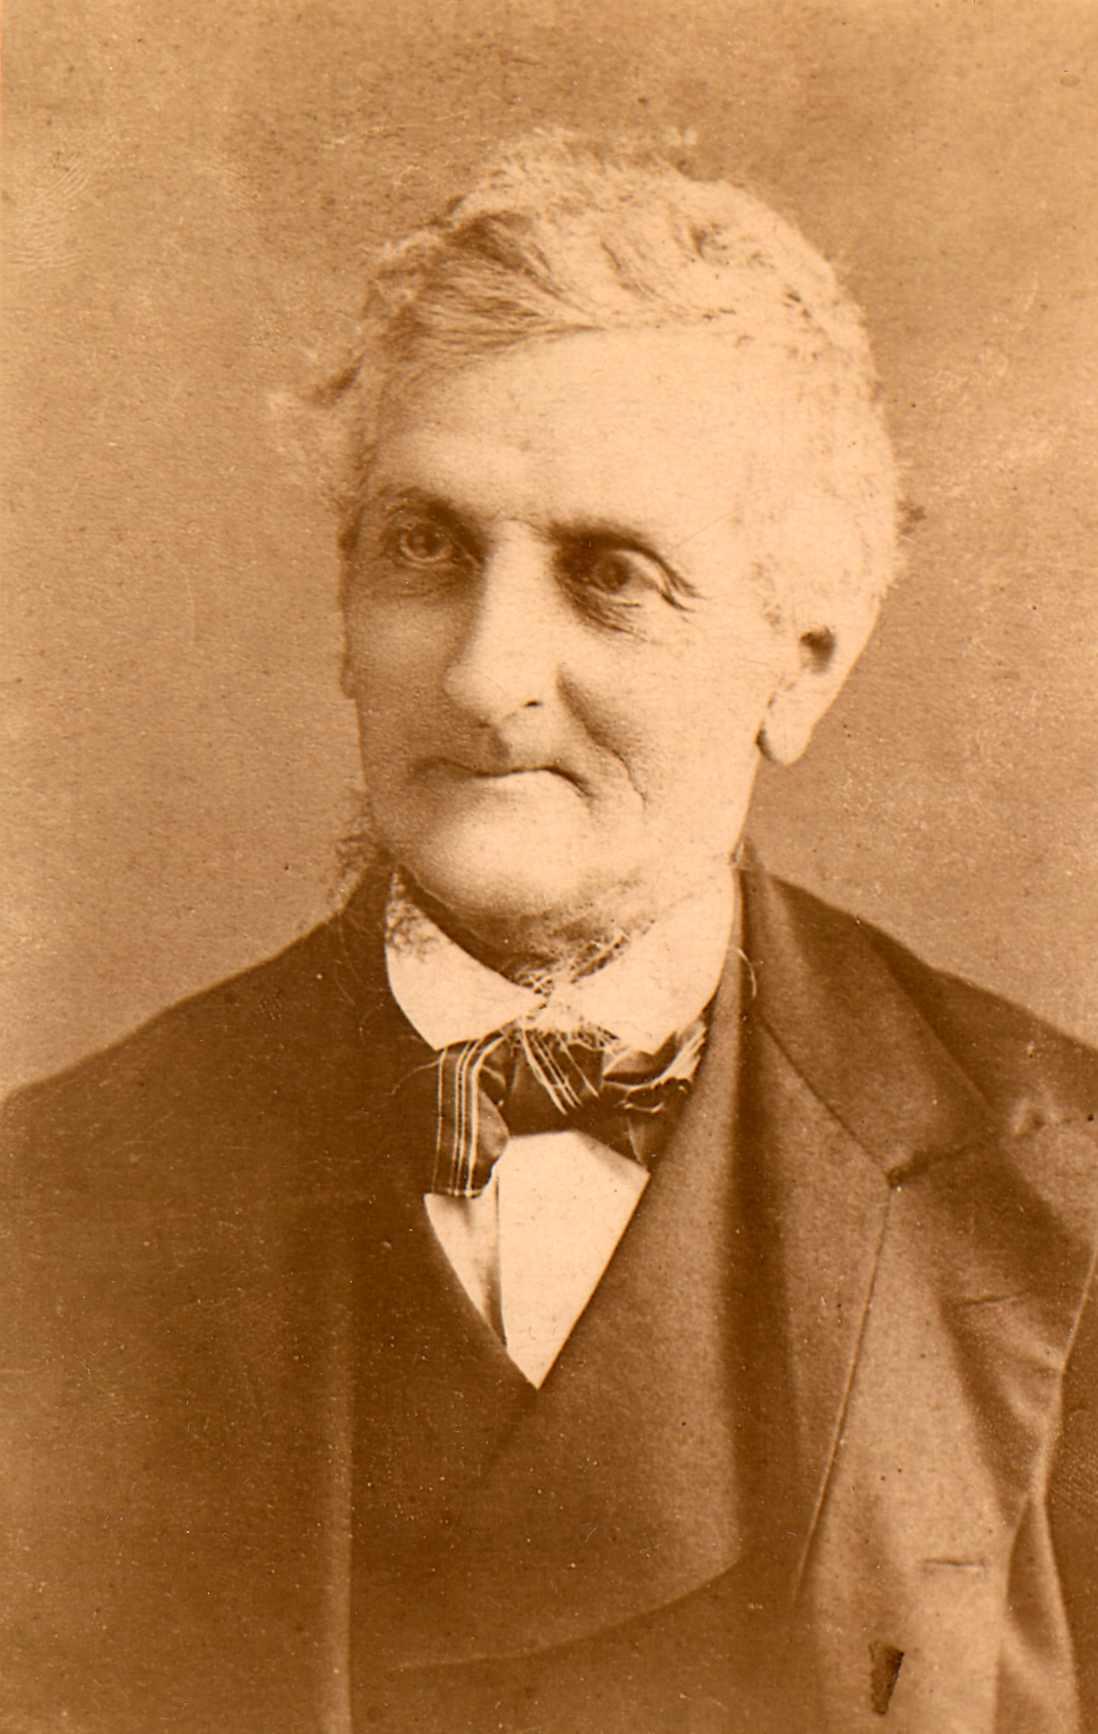 James Langford